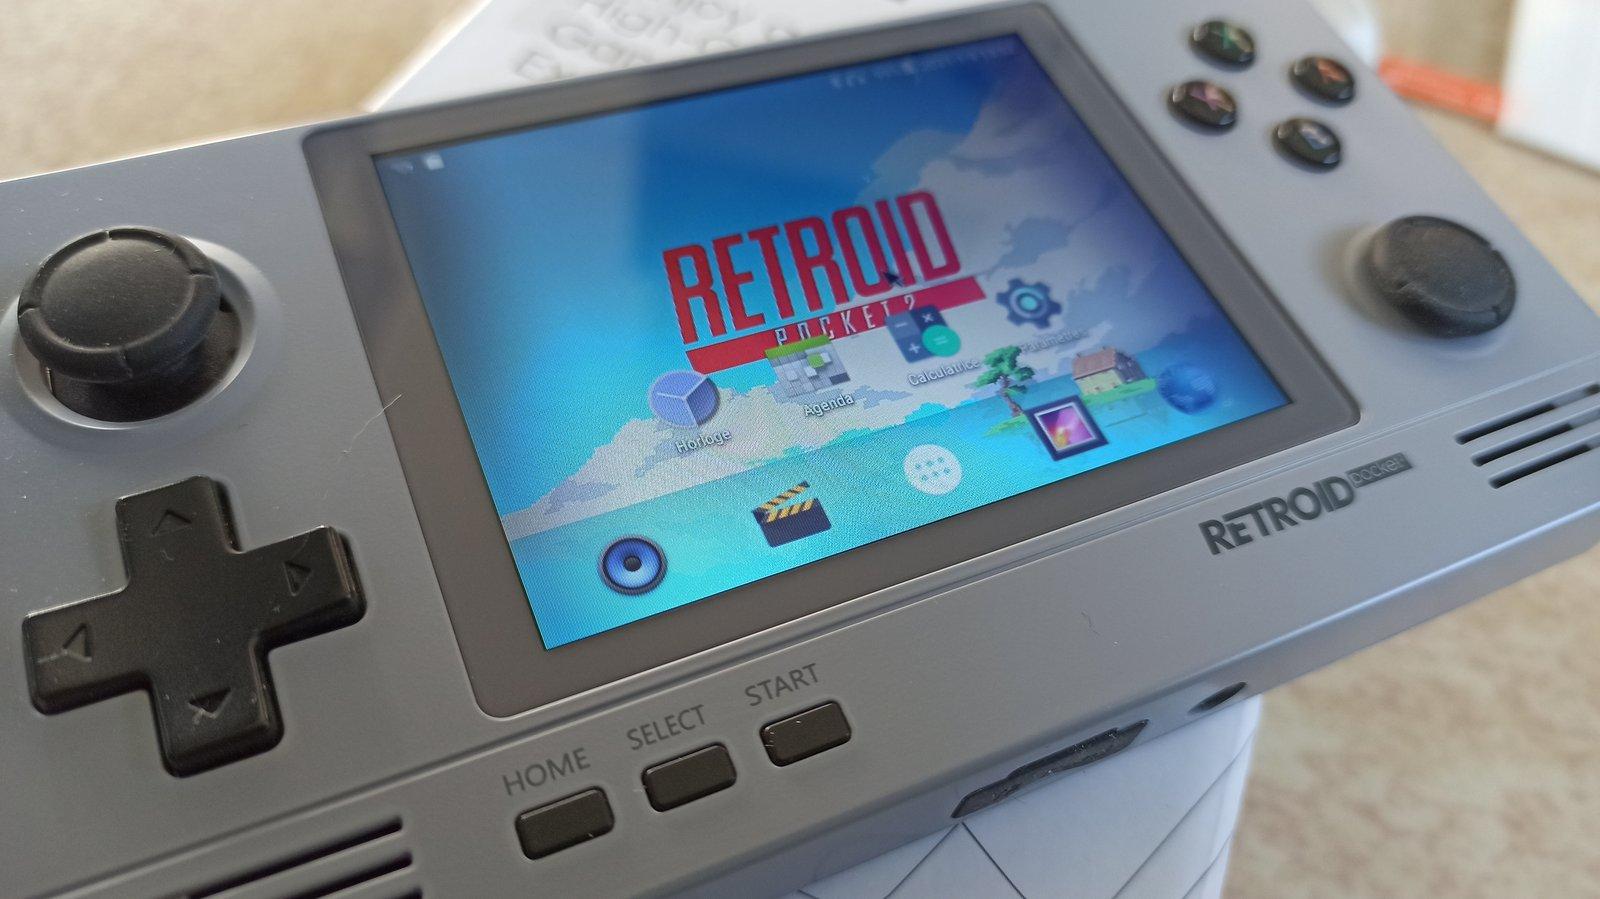 RG350 mod Sakura / Retroid Pocket 2  210110052610569297